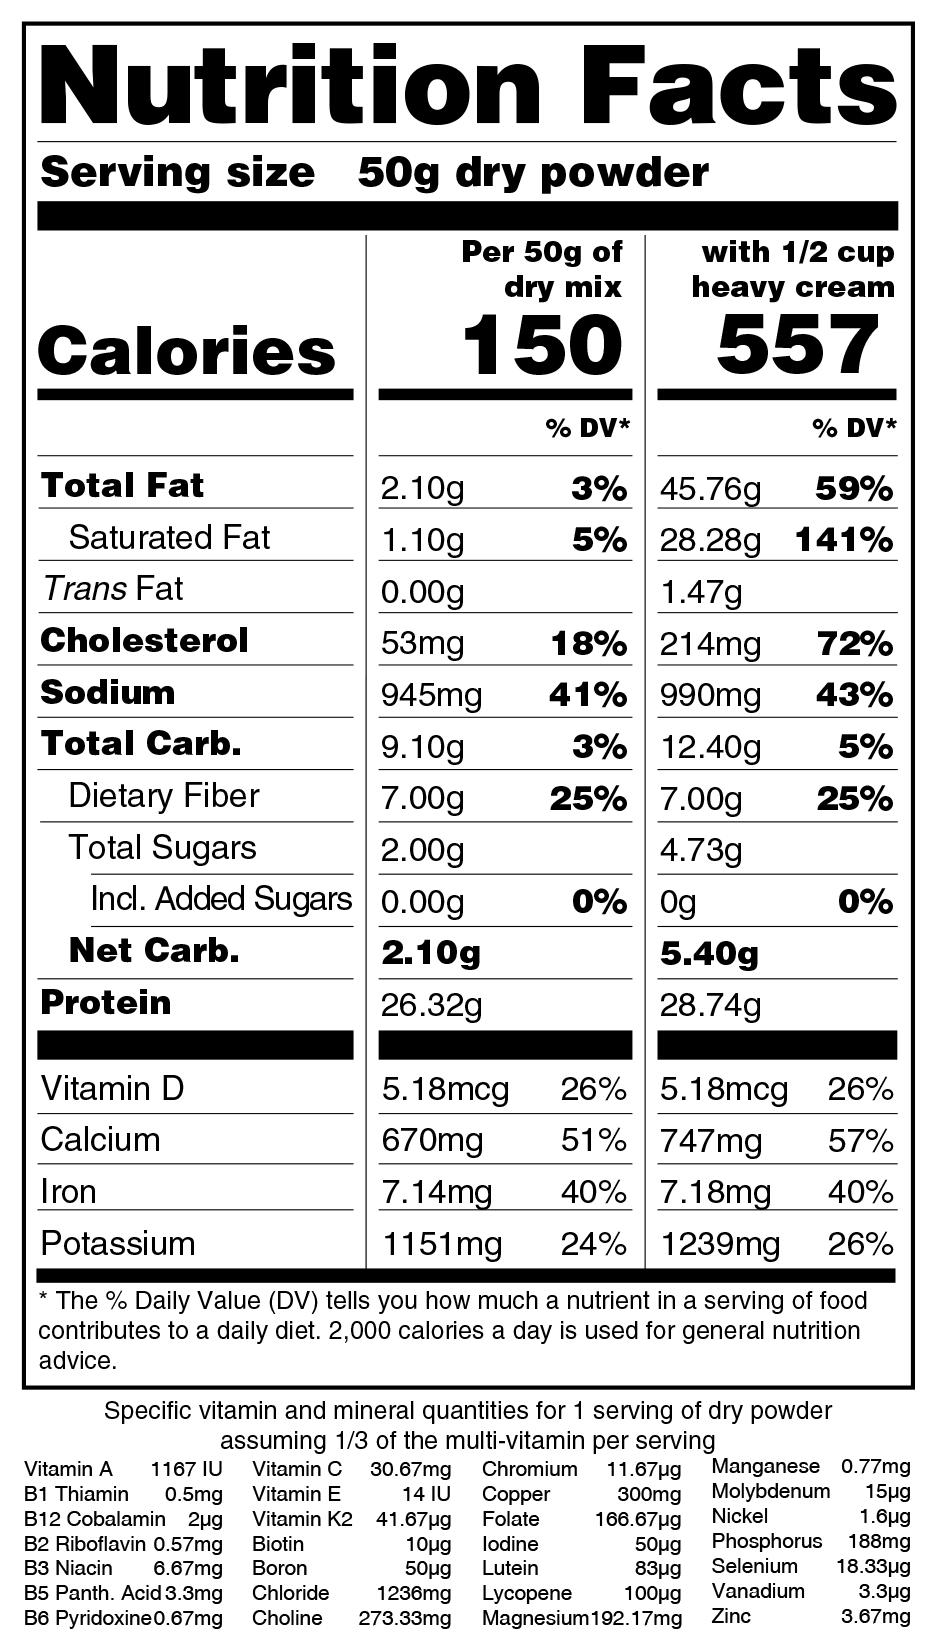 Keto Chow 1 5 Recipe Keto Chow Nutrition Turmeric Benefits Proper Nutrition